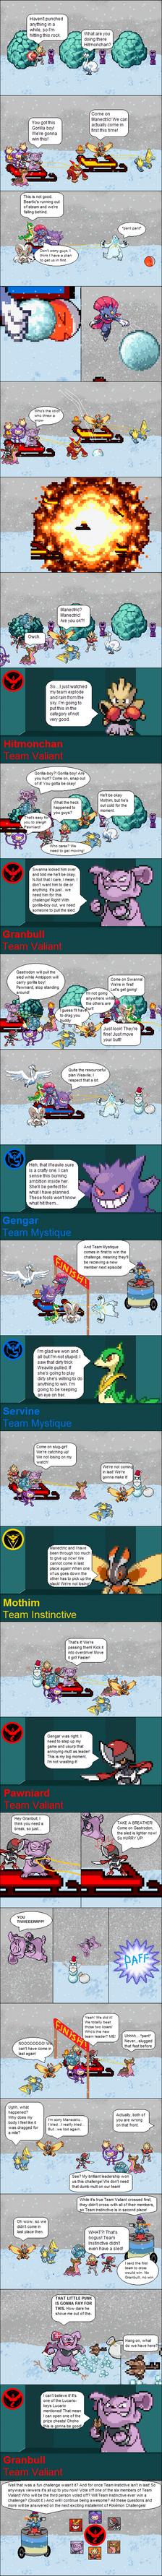 Pokemon Challenges Gen IV Ep 3 - Part 3 by pokemonmanic3595